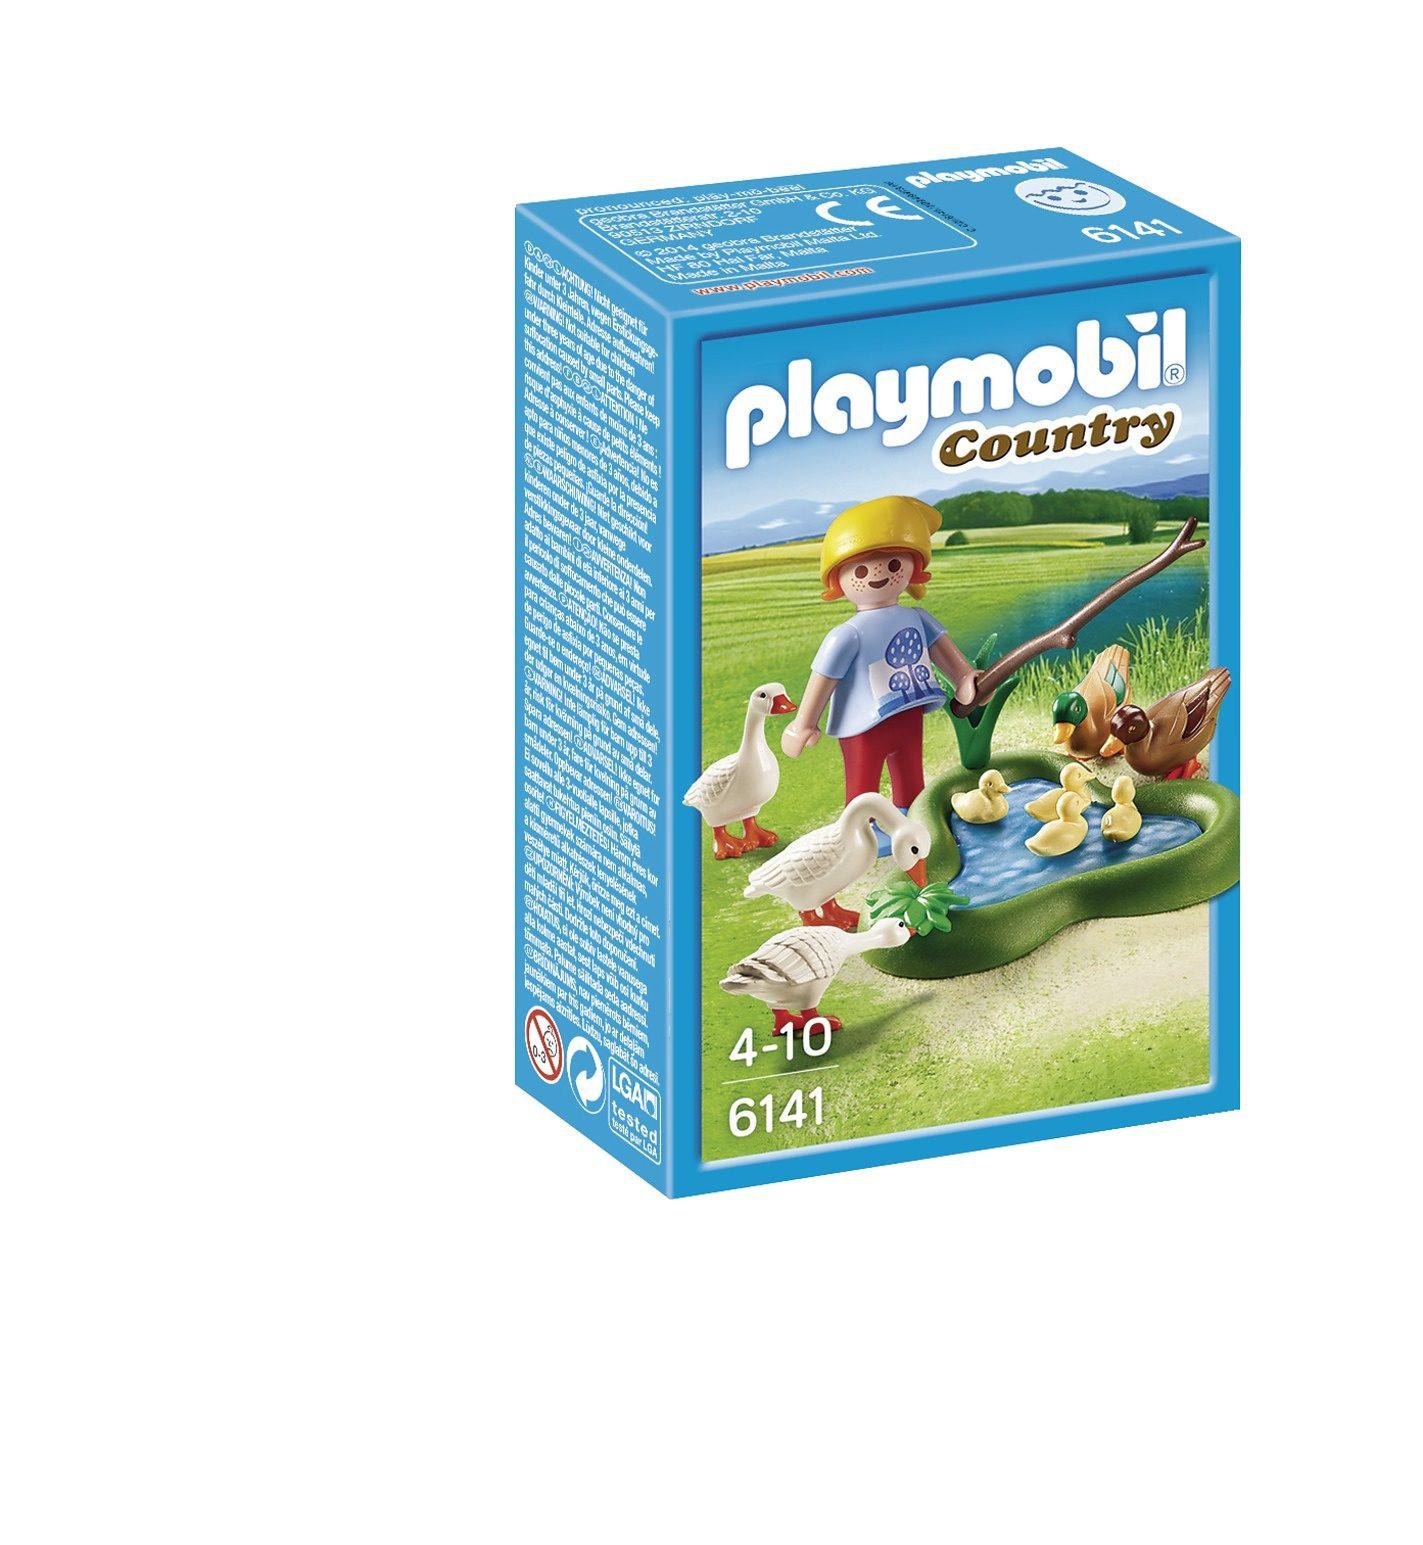 Playmobil® Enten und Gänse am Teich (6141), Country